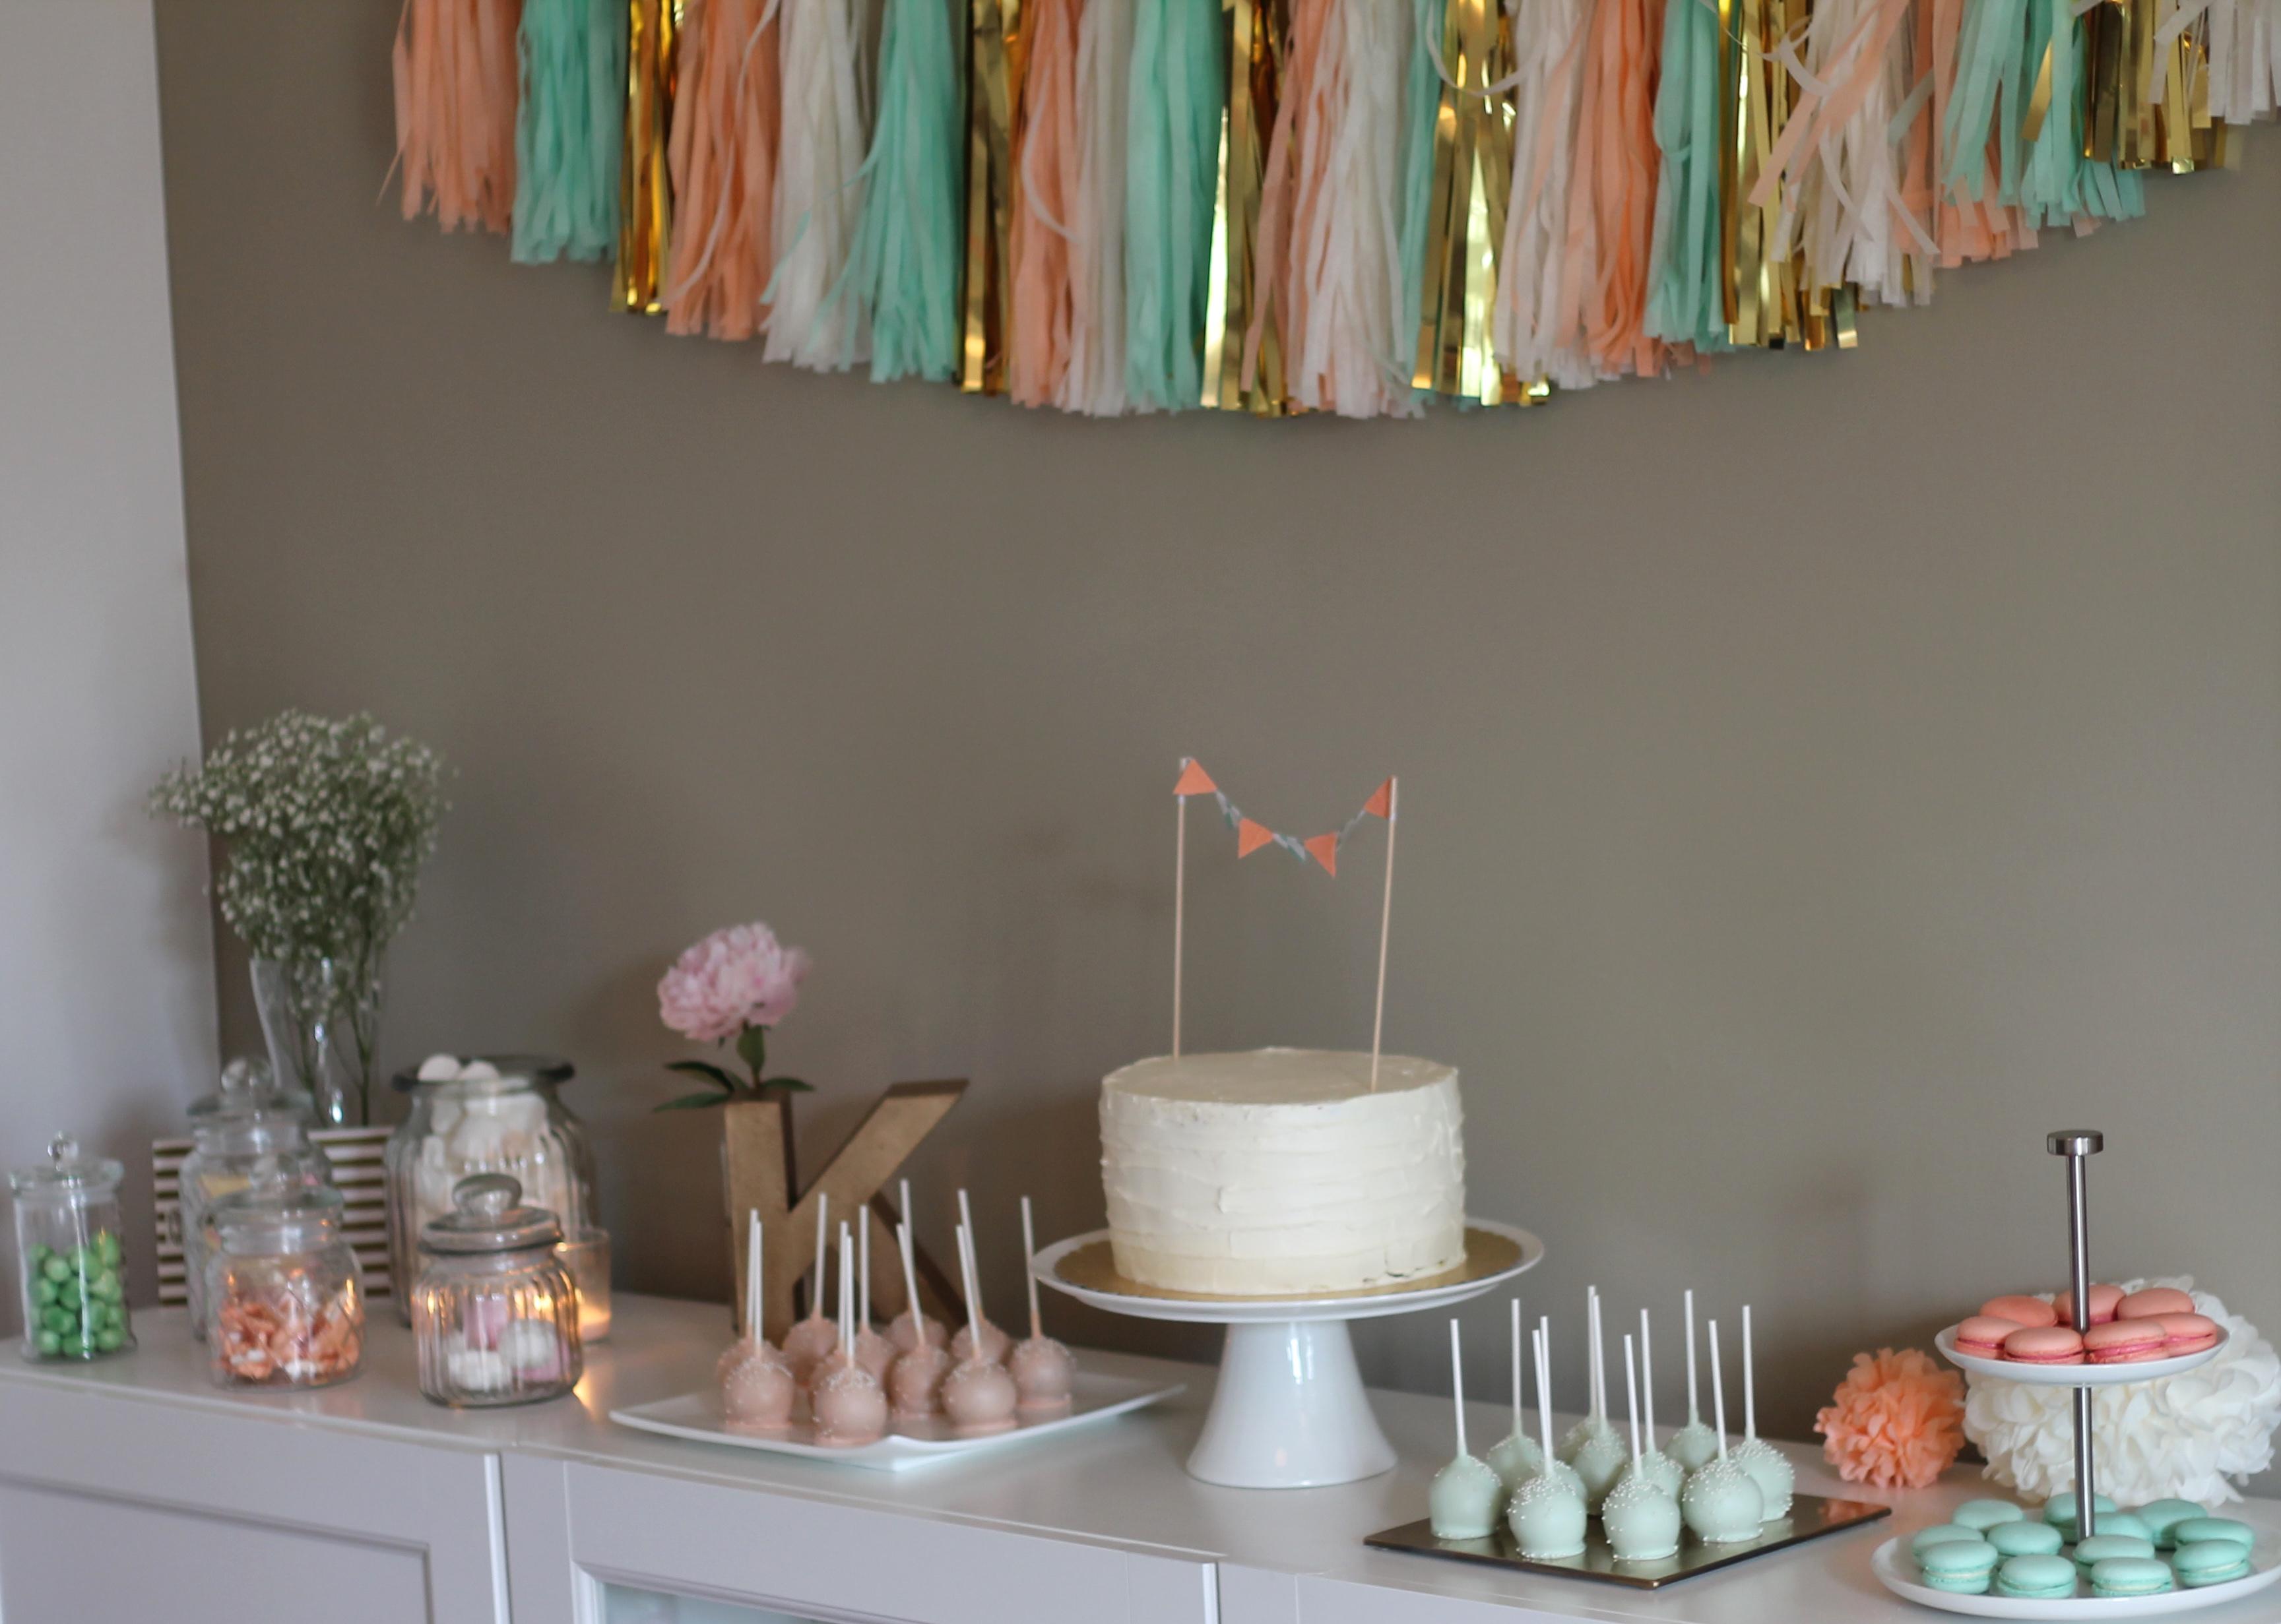 Katharinas Junggesellinnenabschied Sweet Table Dekoration